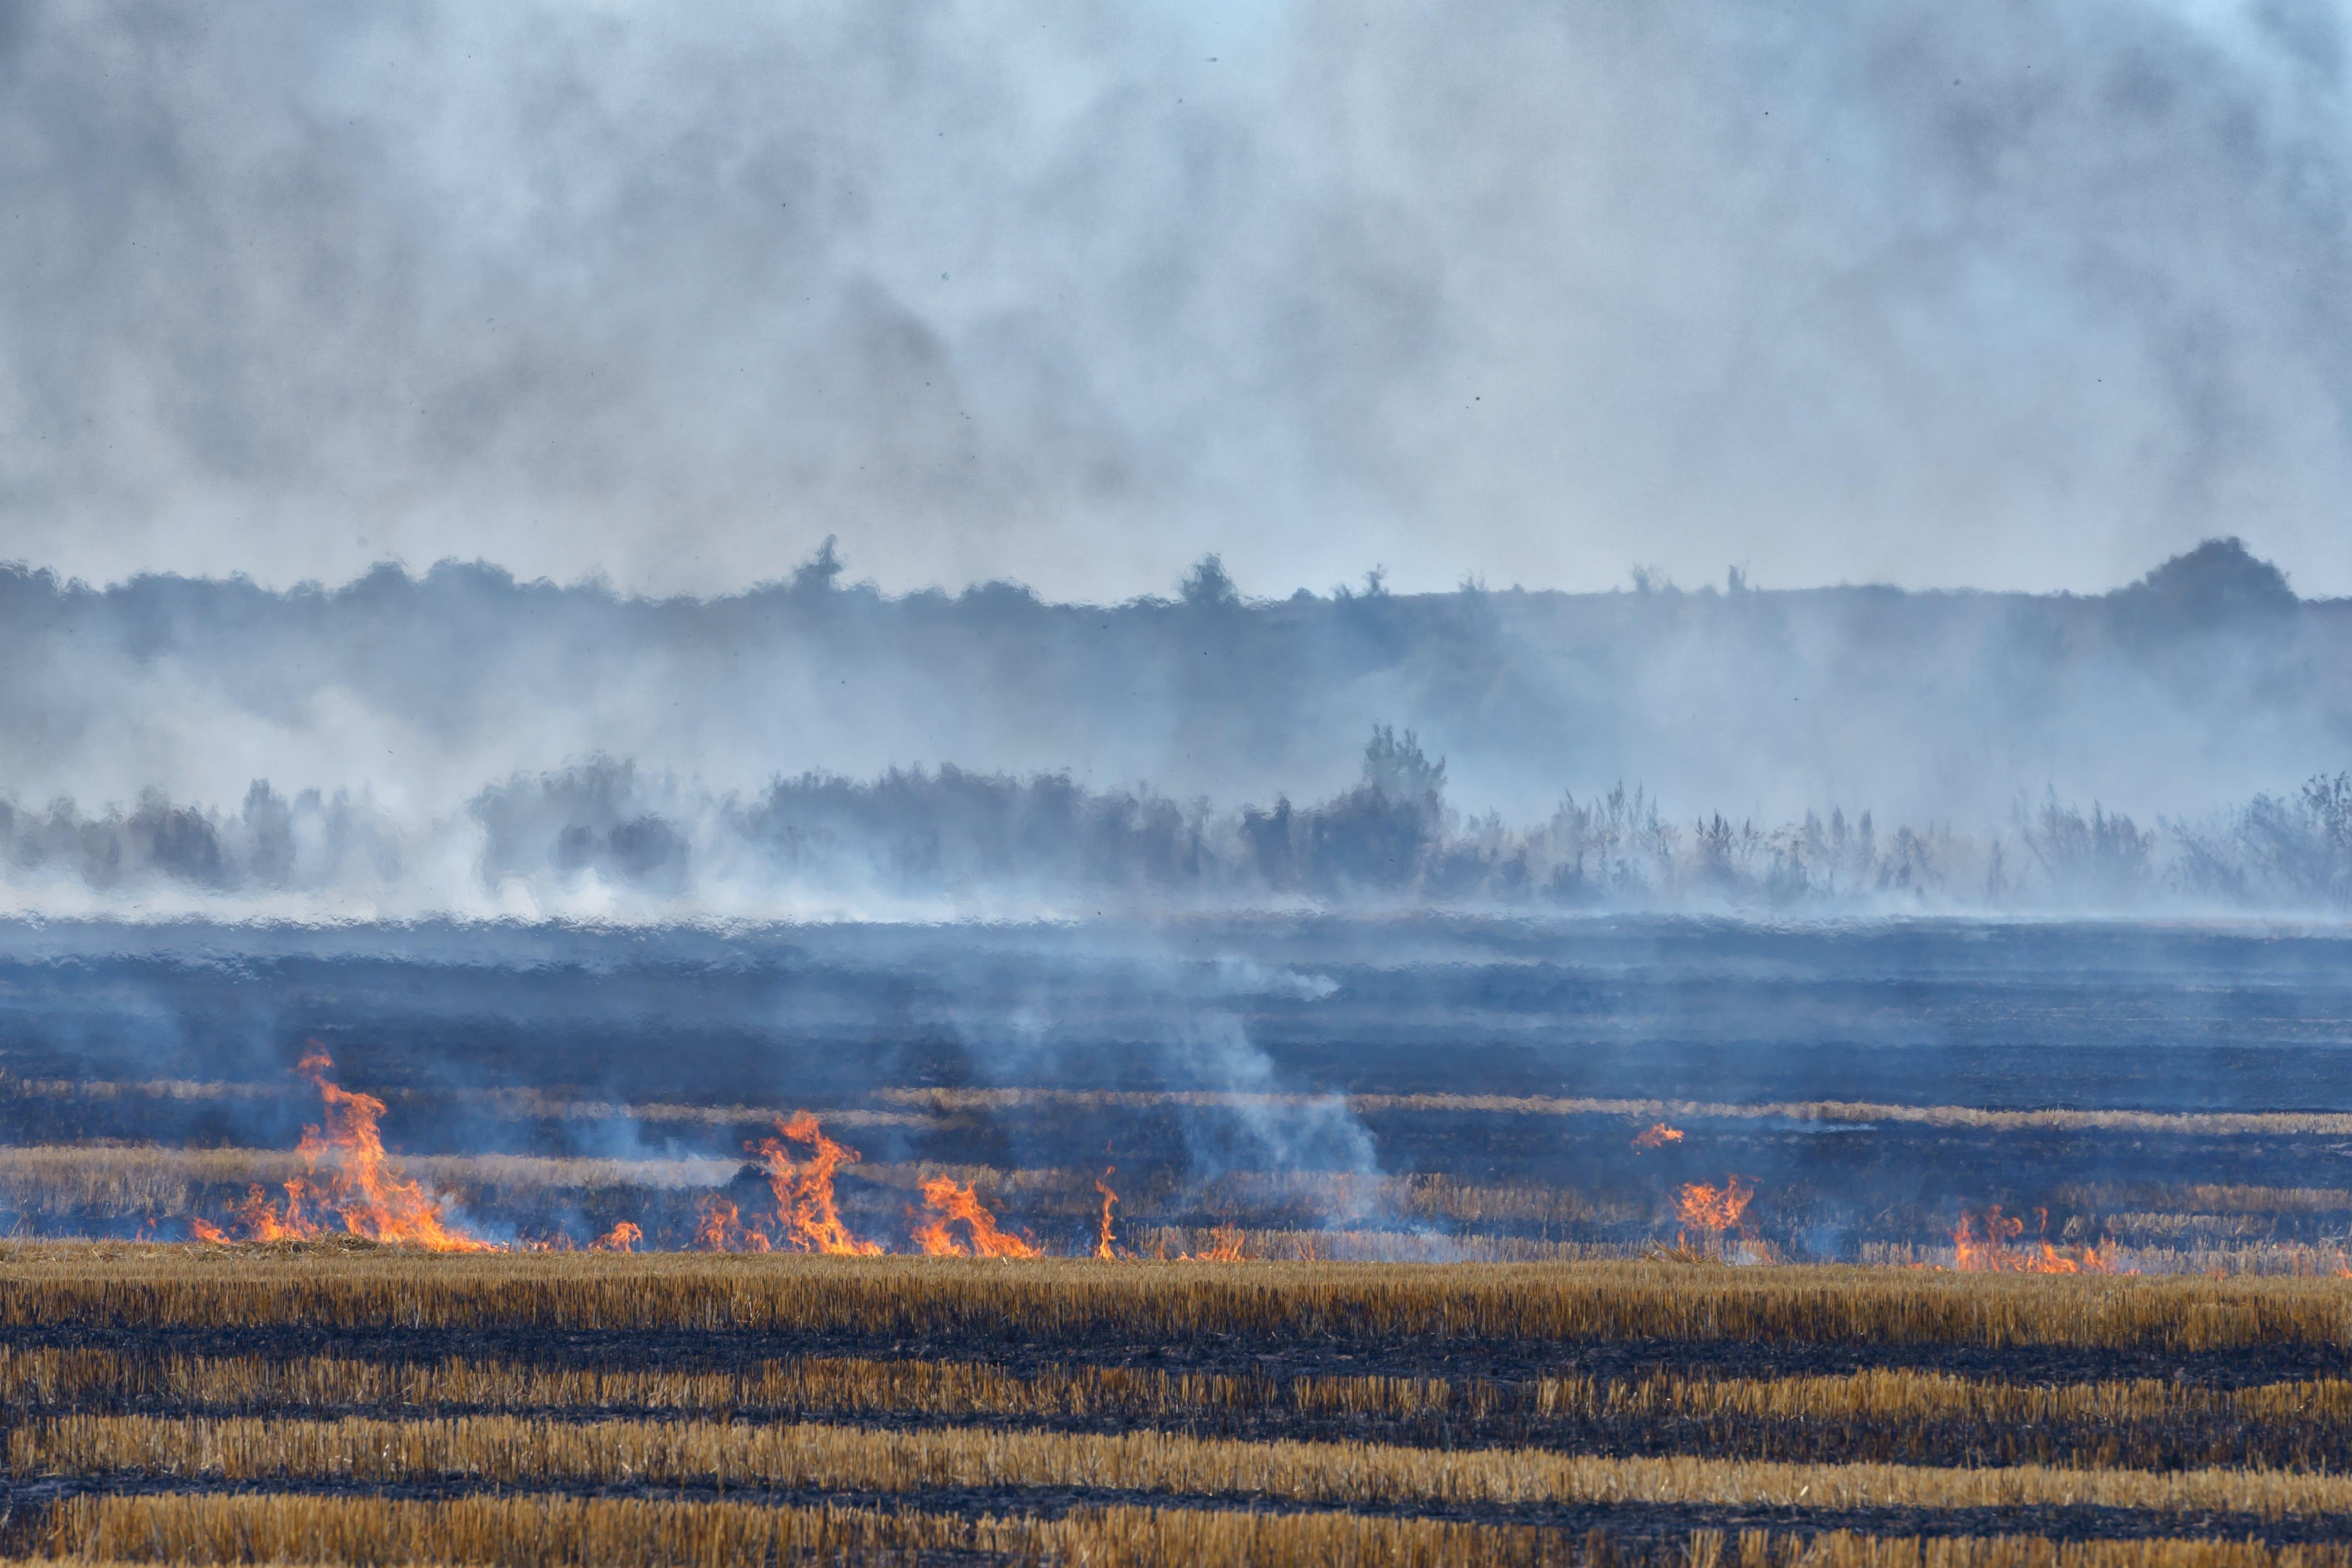 Wildfire burning down hemp fields